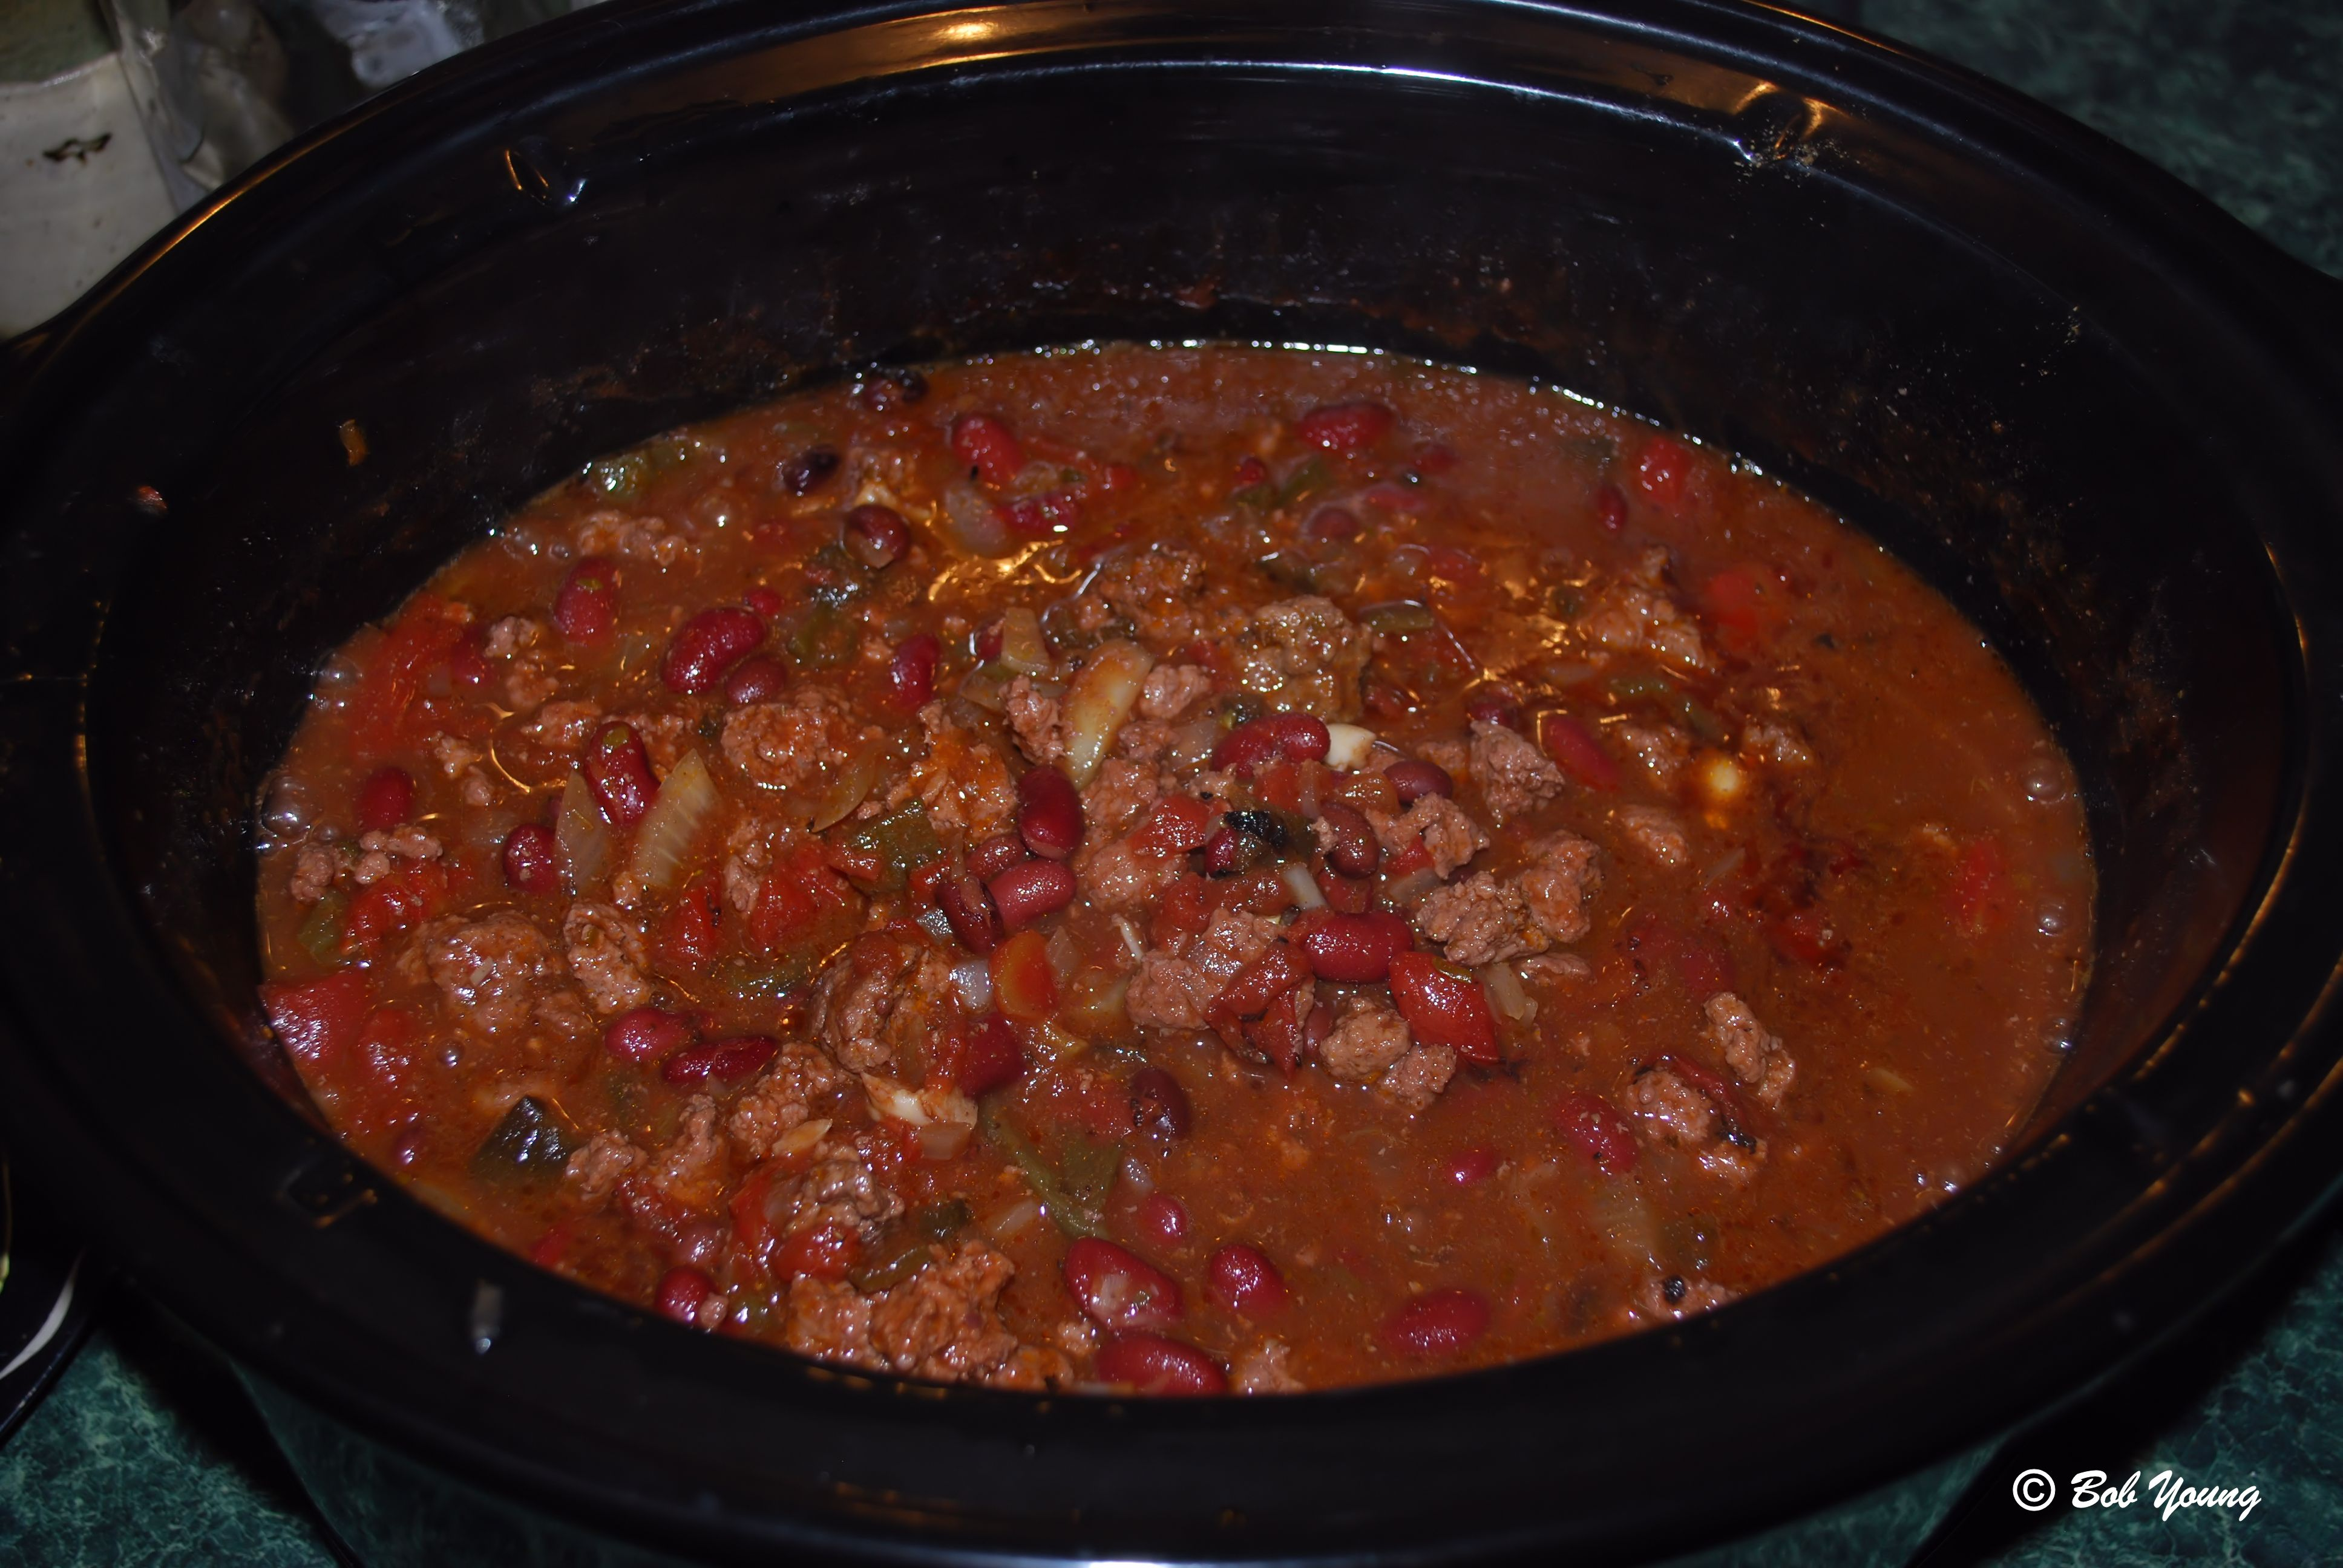 15dec2012_1_moms-chili_in-pot-cooking.jpg